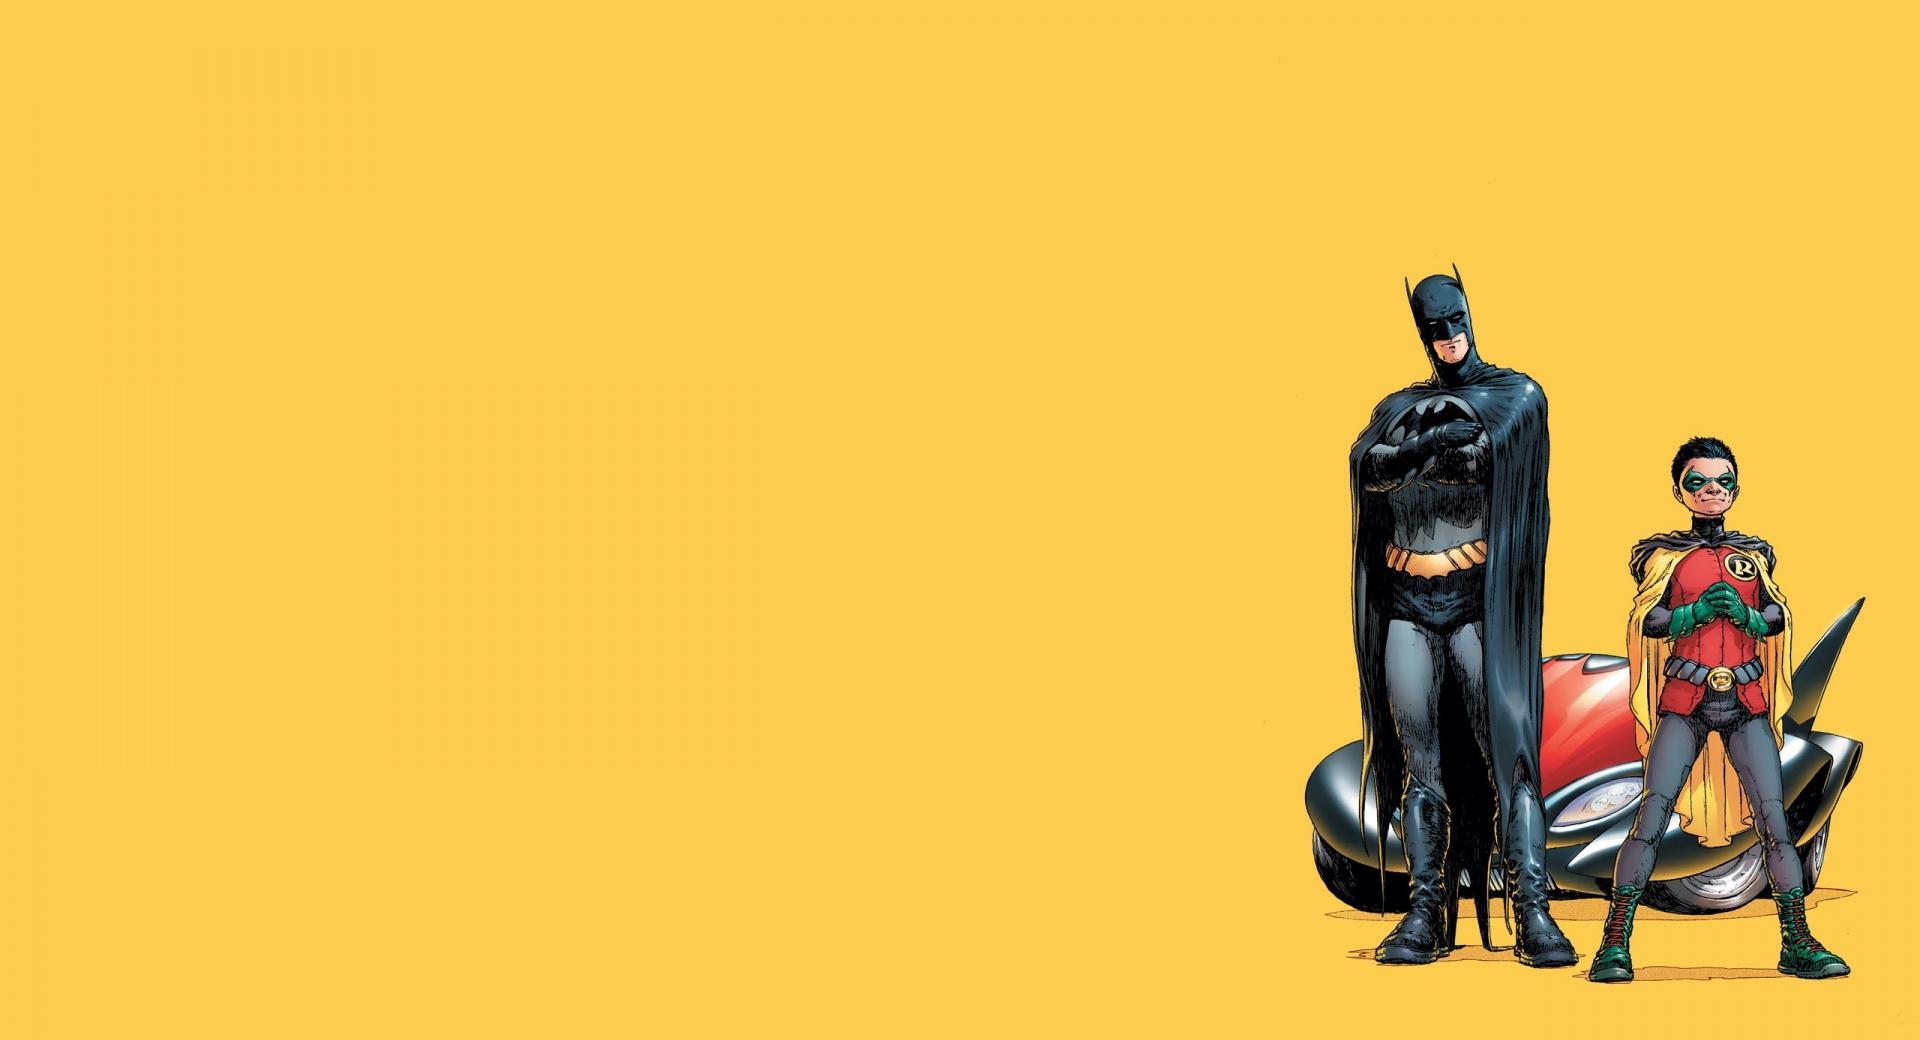 Batman And Robin Cartoon wallpapers HD quality